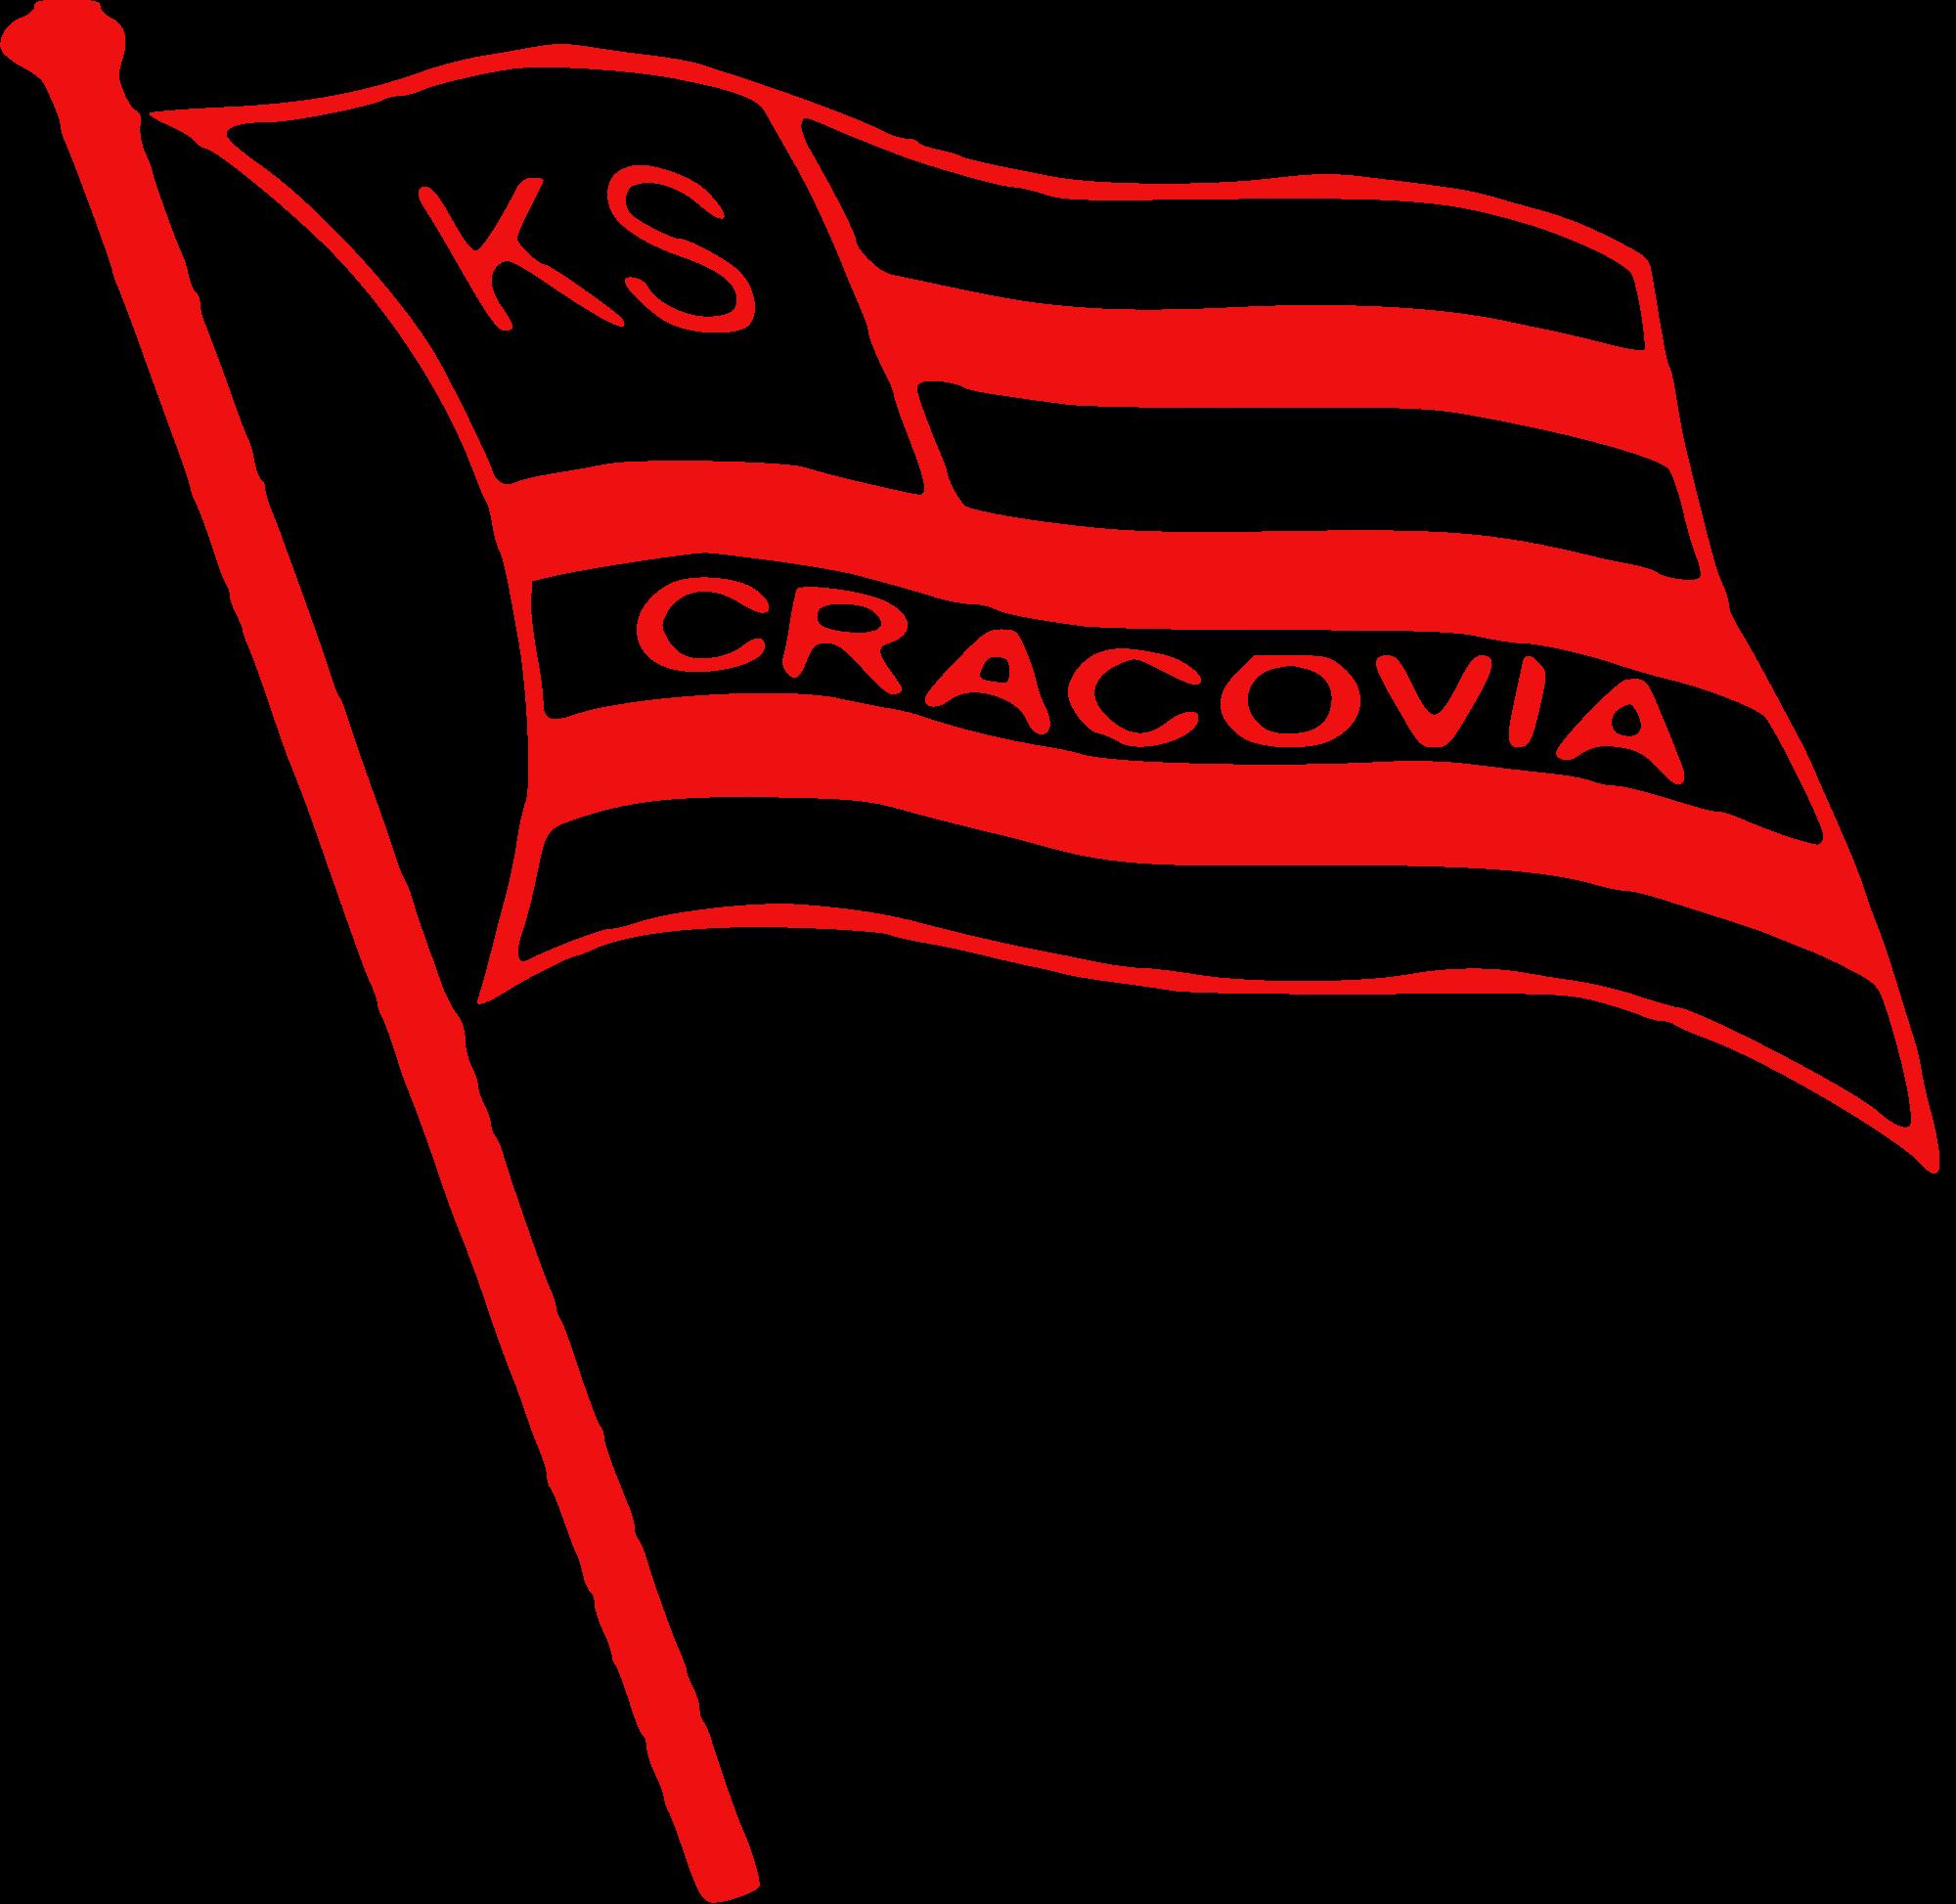 logo cracovia